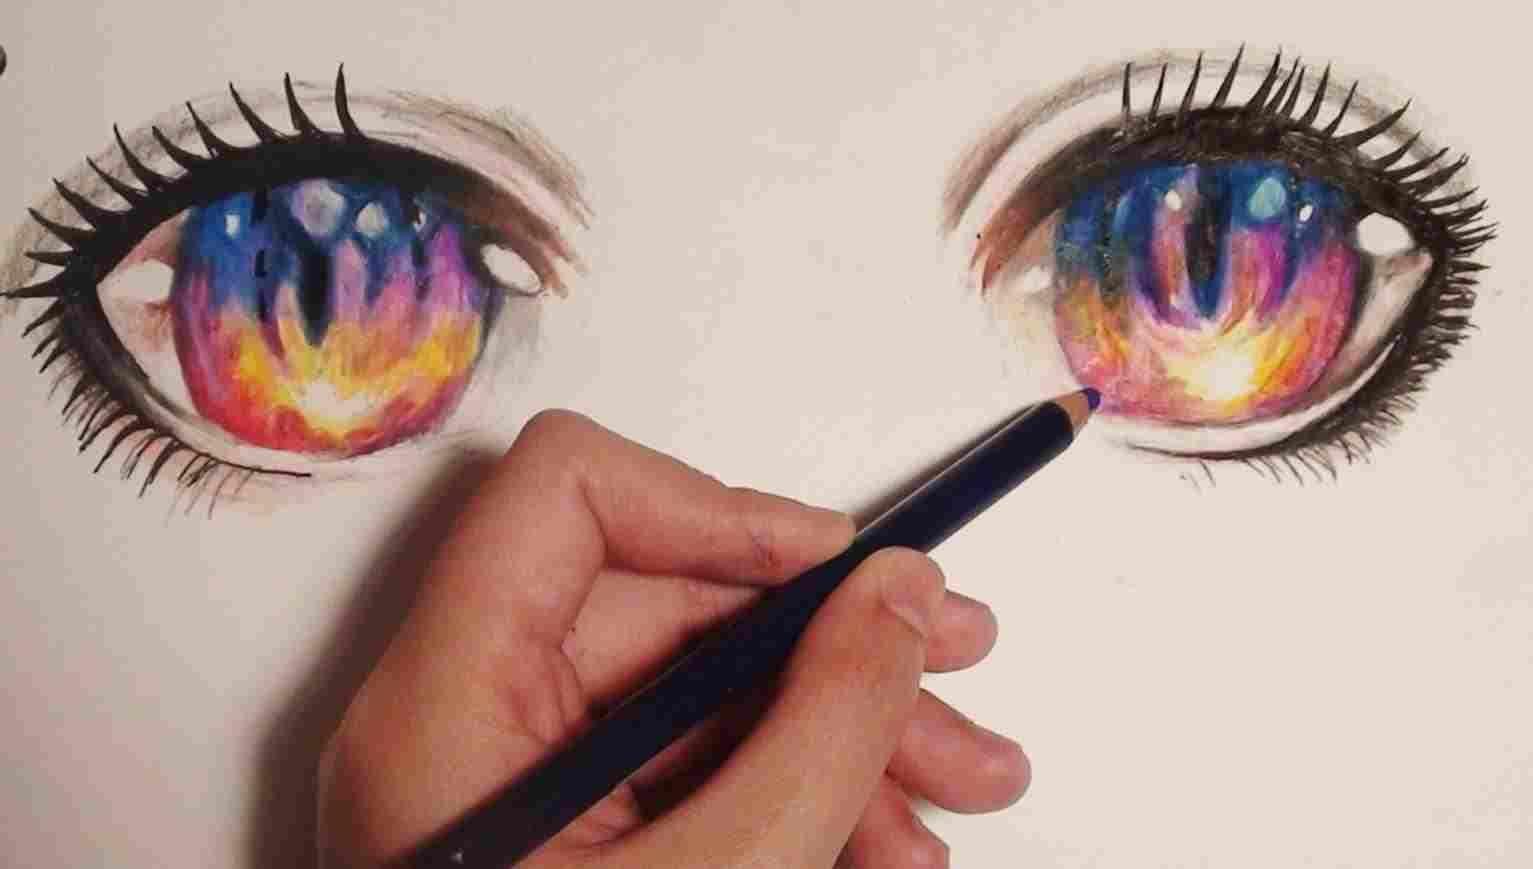 Cute Manga How To Beautiful Rhartsketchescom Draw Anime Eyes